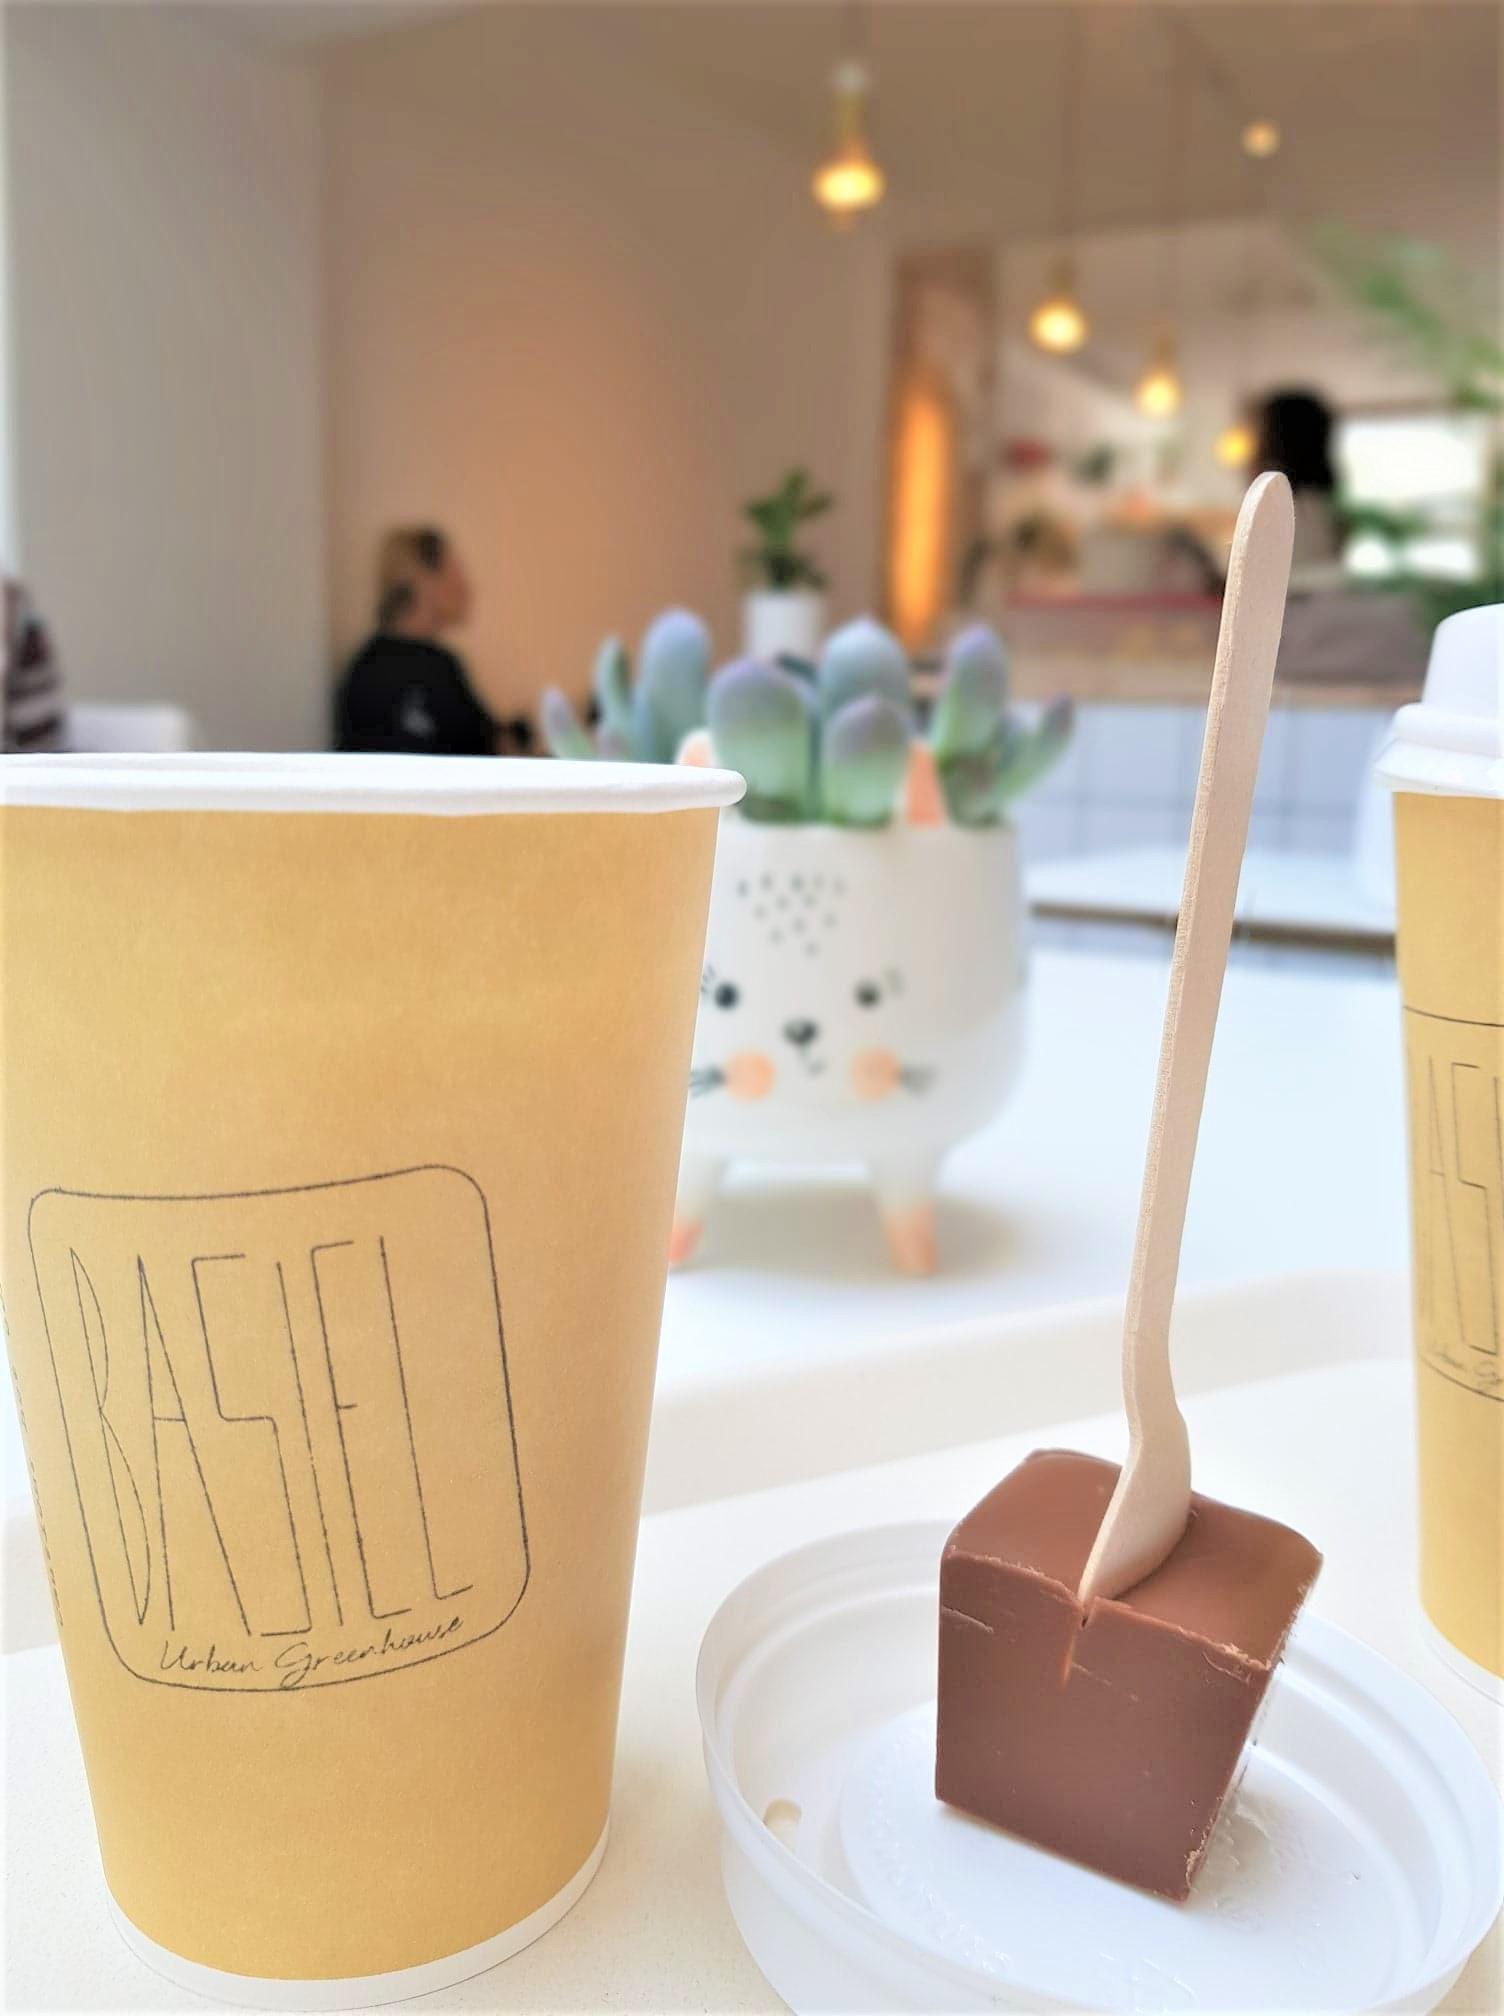 Bruges-Belgique-Blog-voyage-Clioandco-Bruges-café-Basiel-urban-green-house-chocolat-chaud